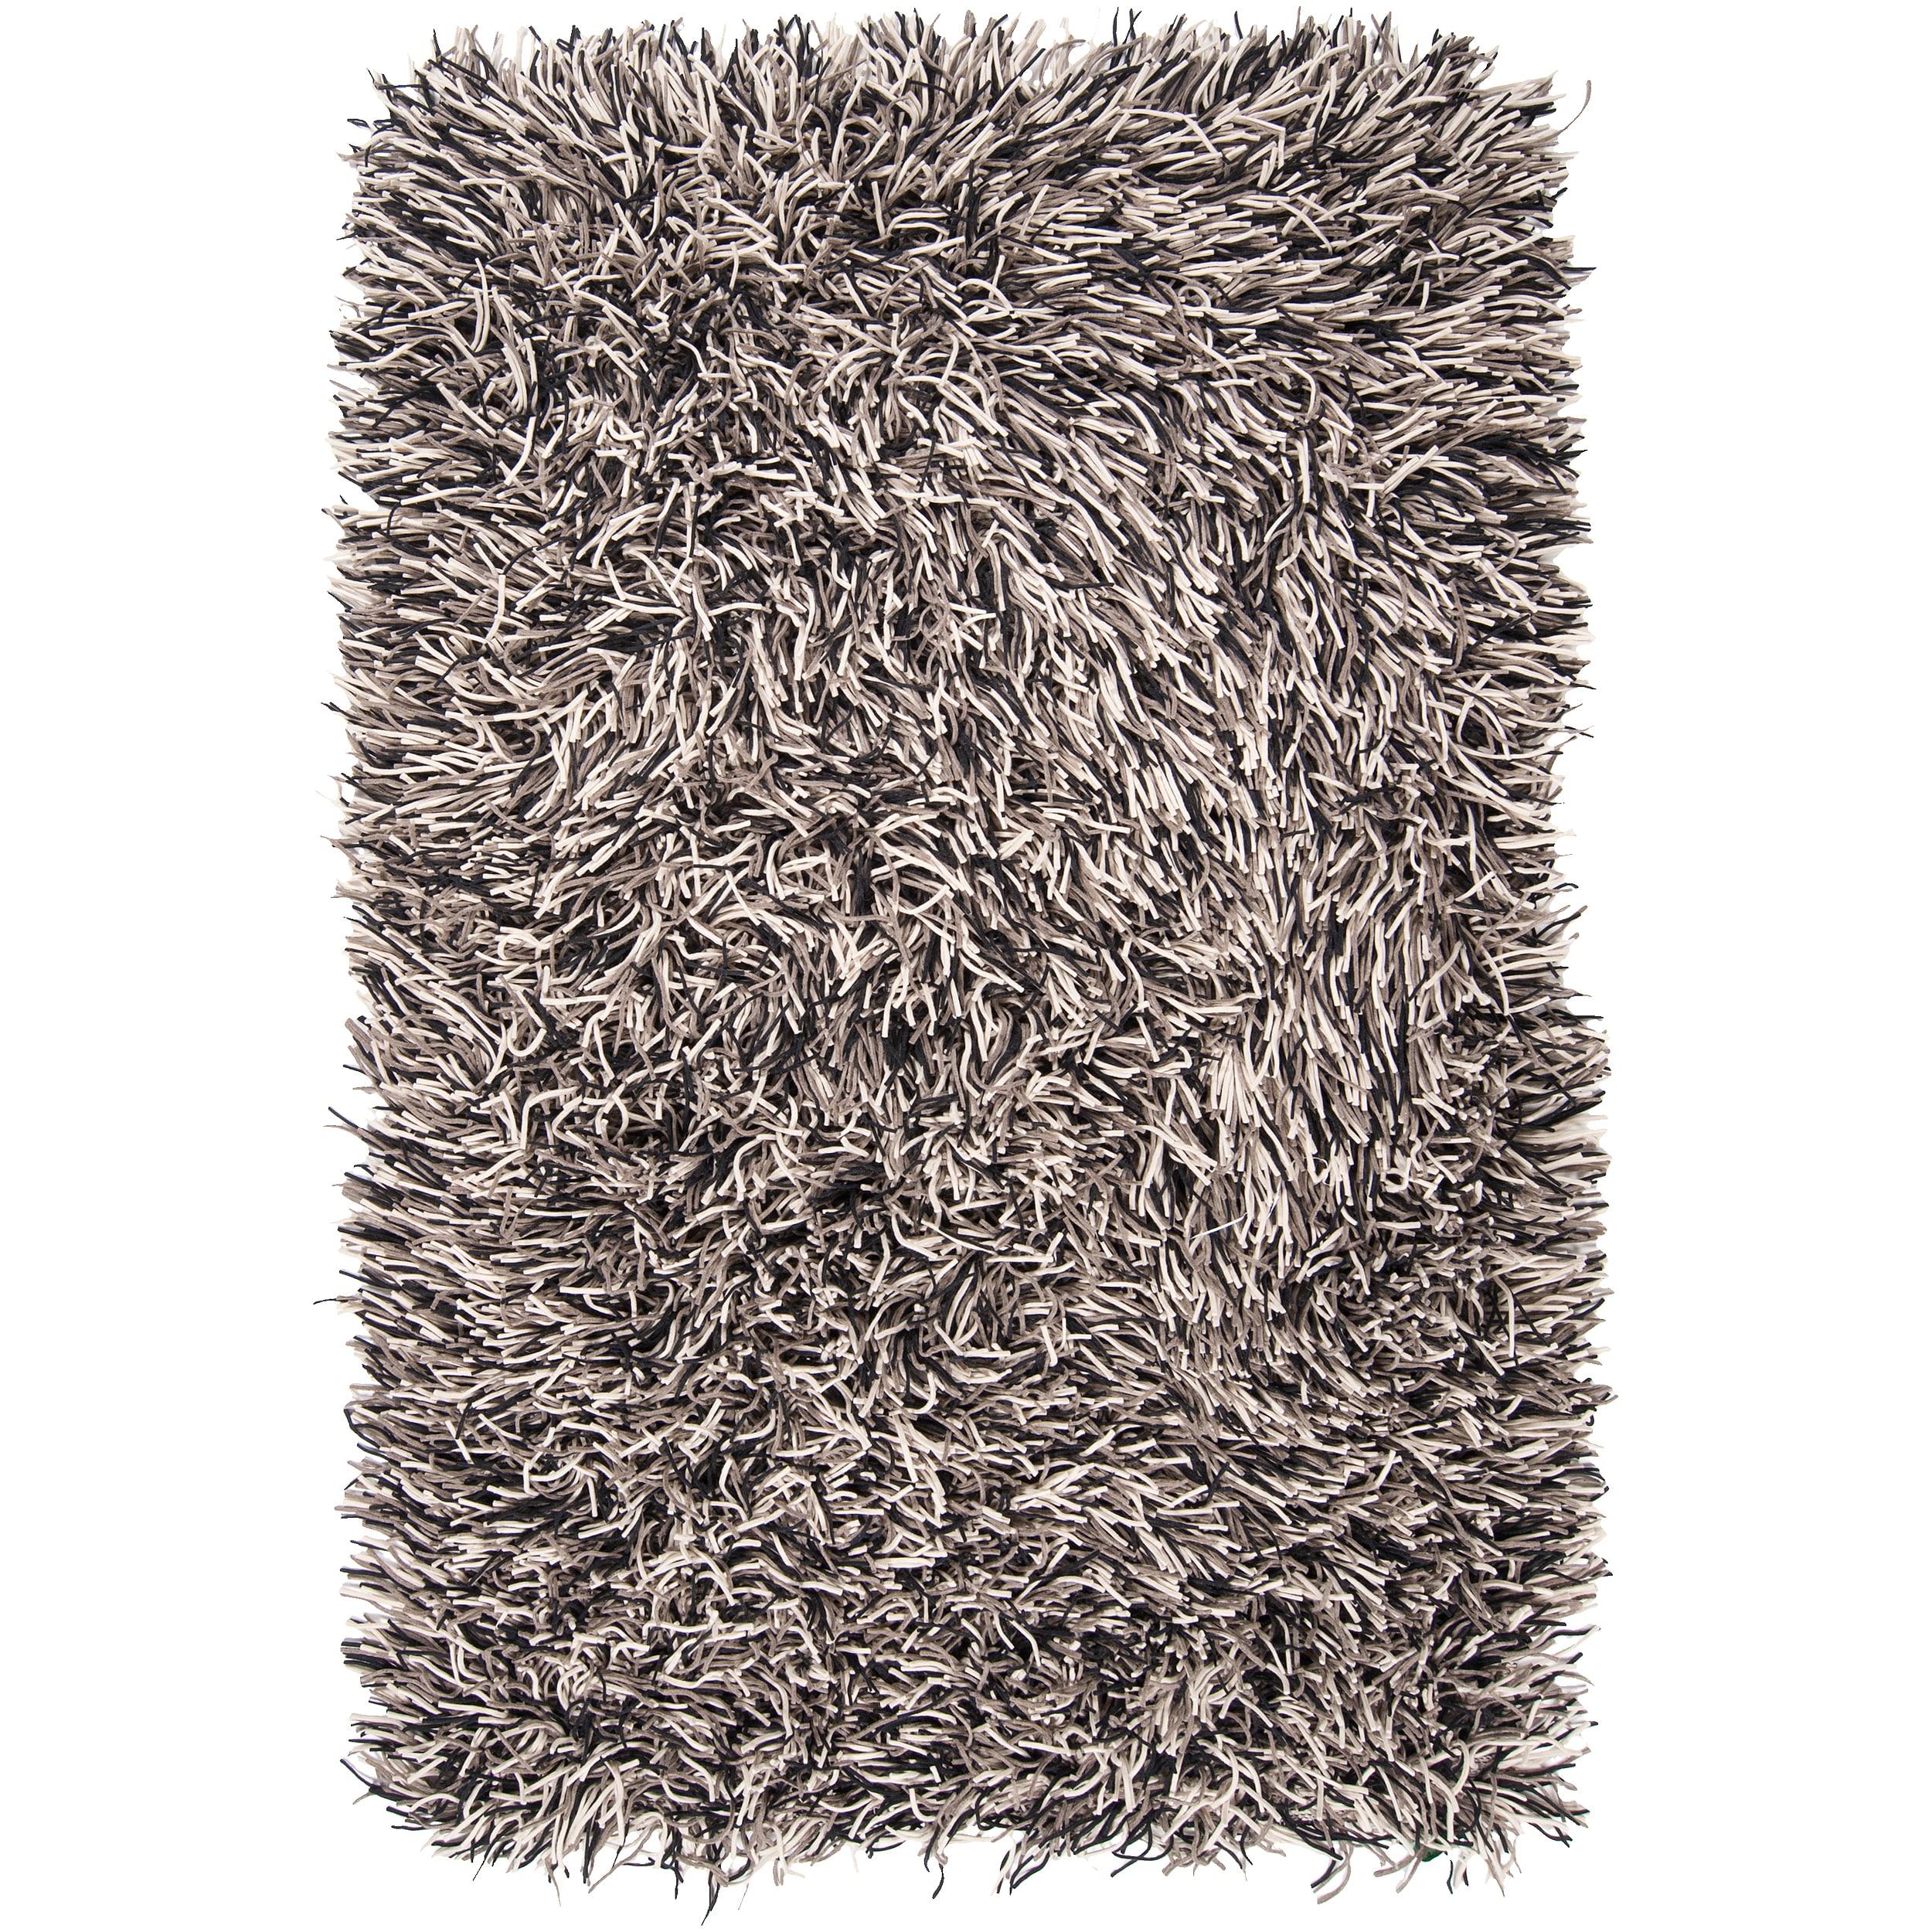 Hand-woven Black Caco New Zealand Felted Wool Plush Shag Rug (5' x 8')